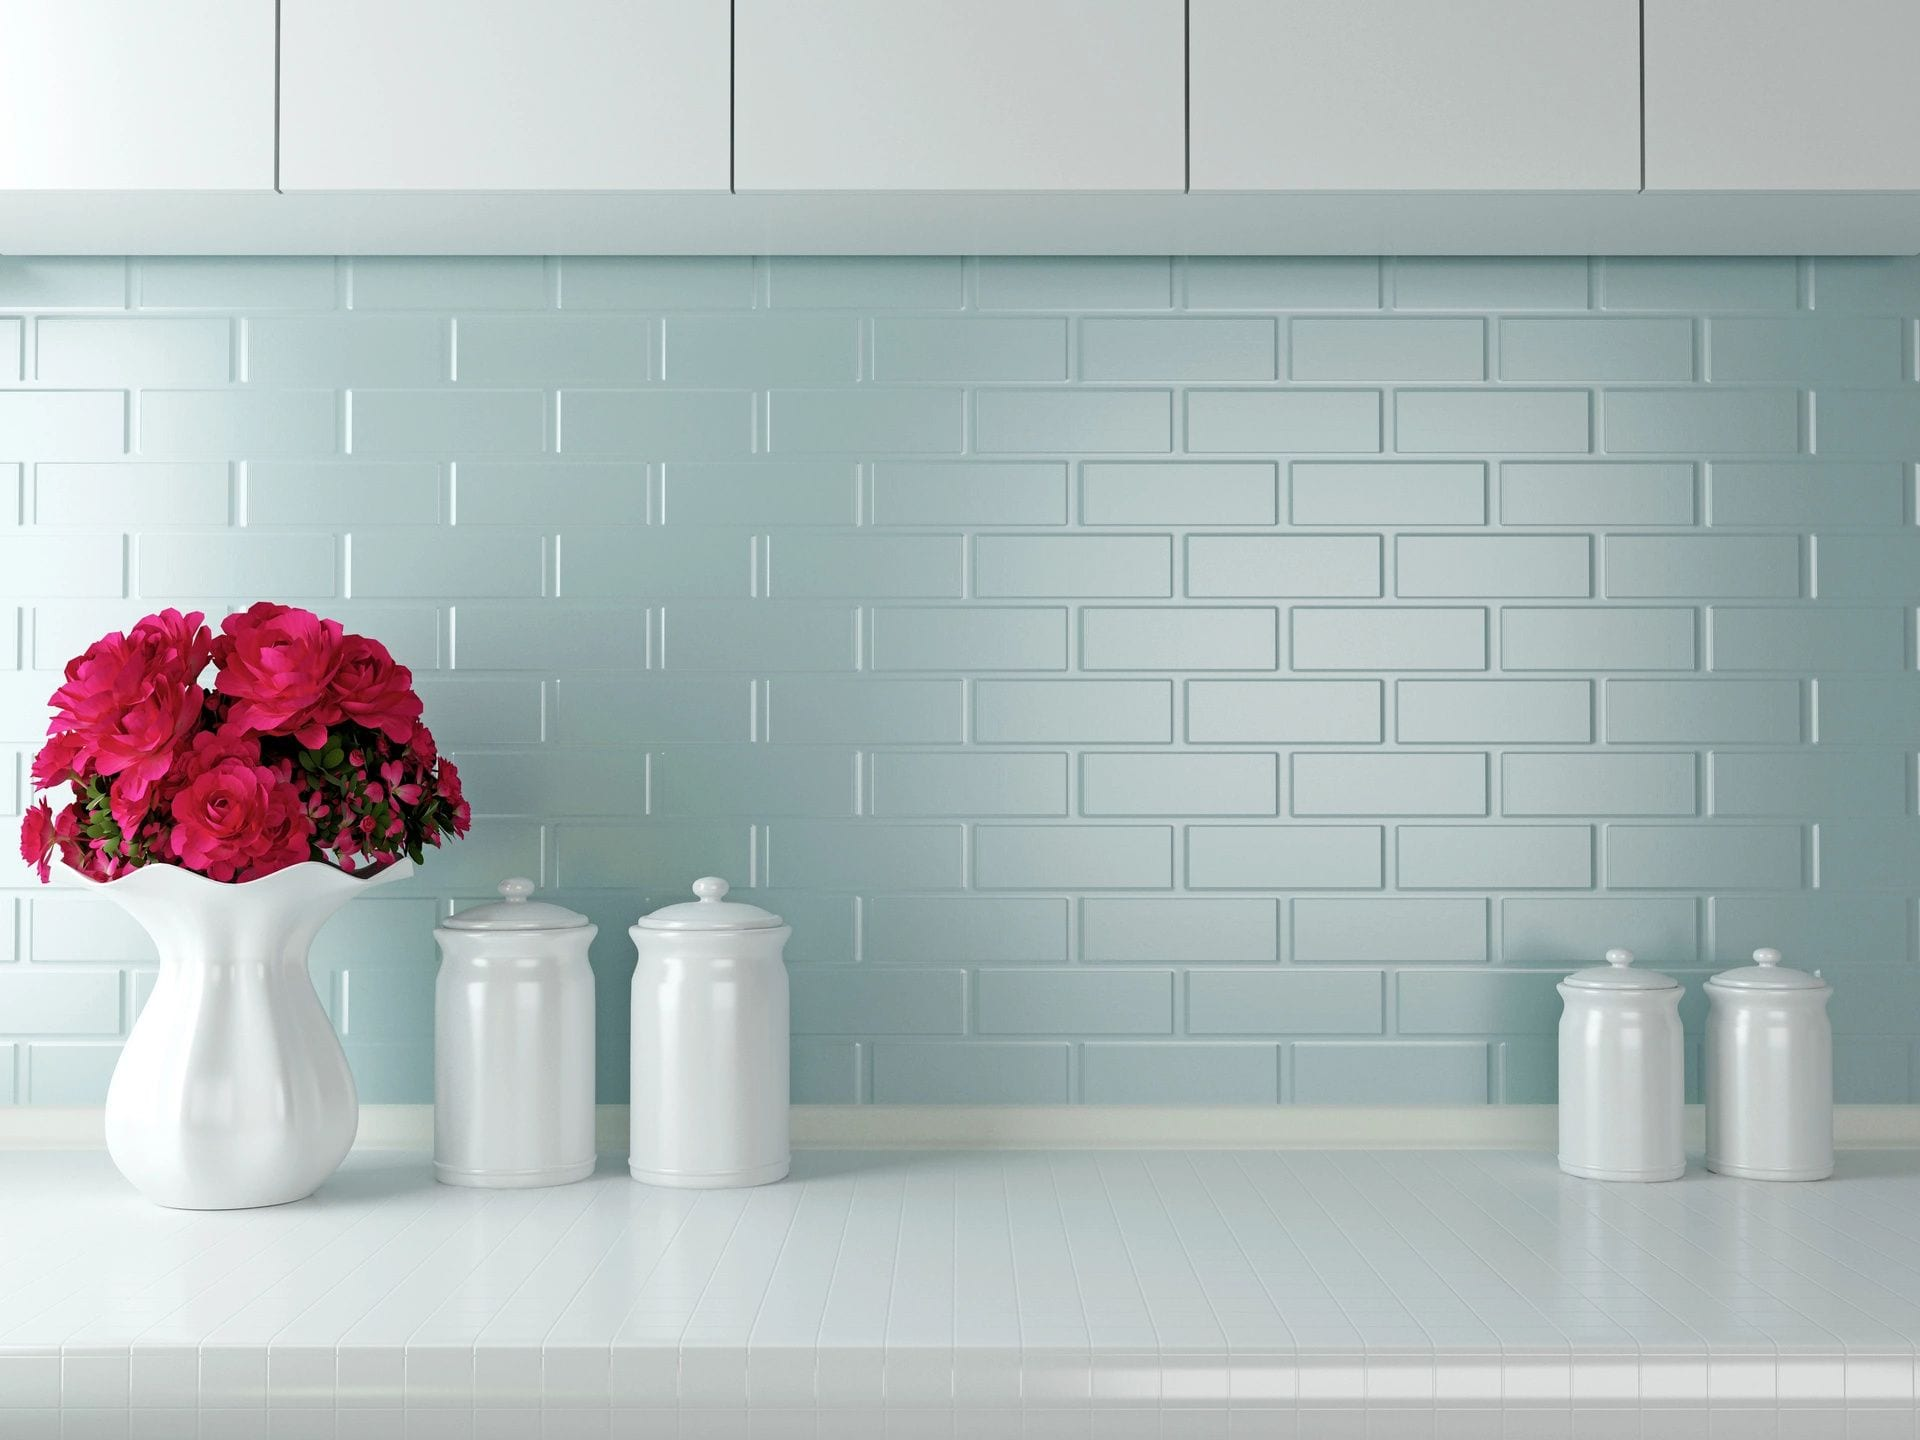 Tile store supplying ceramic tile, porcelain tile, glass tile, mosaic tile in Tacoma WA